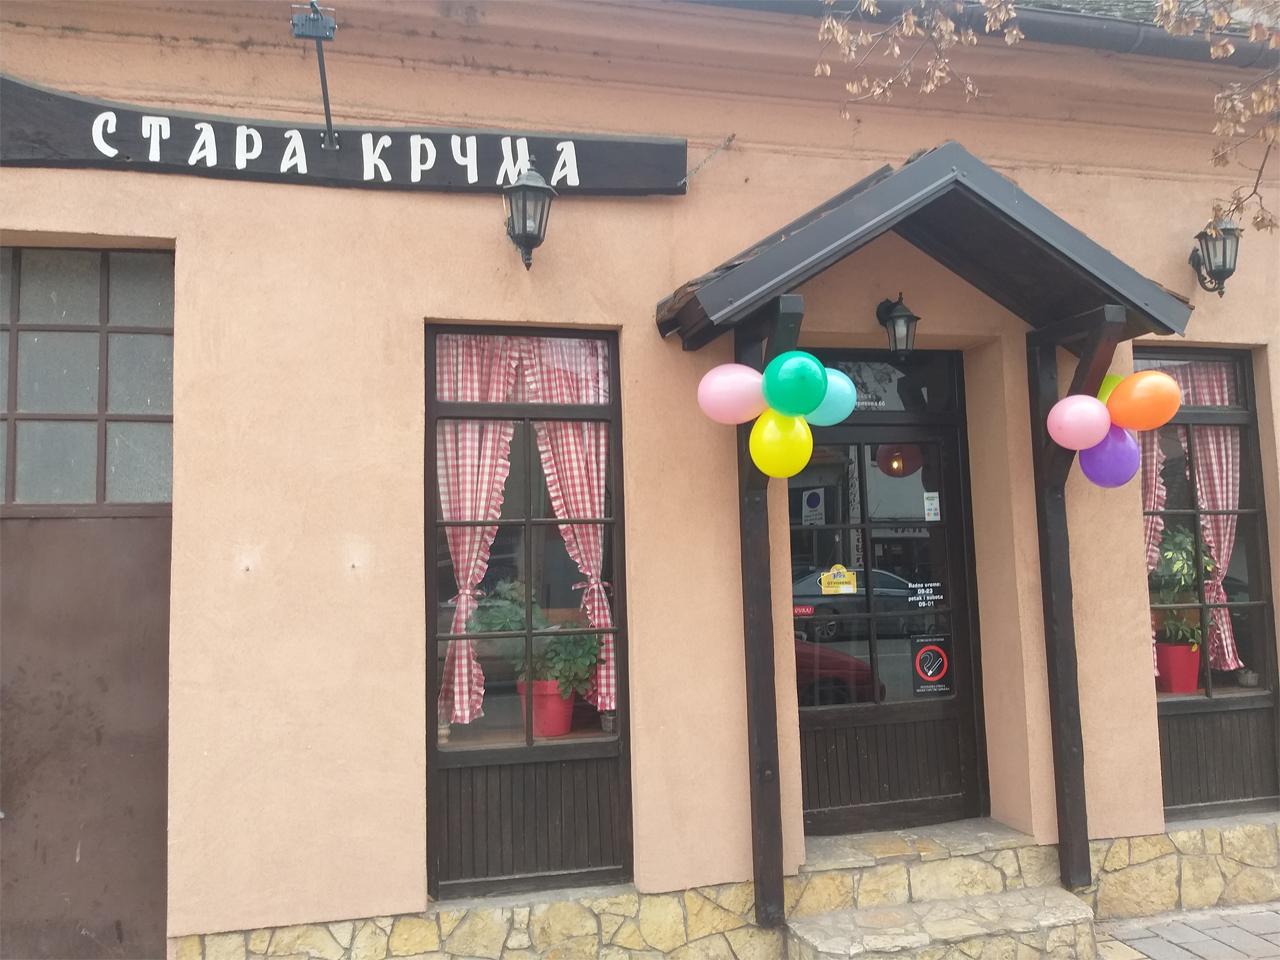 РЕСТОРАН СТАРА КРЧМА 1901 Кетеринг Шабац